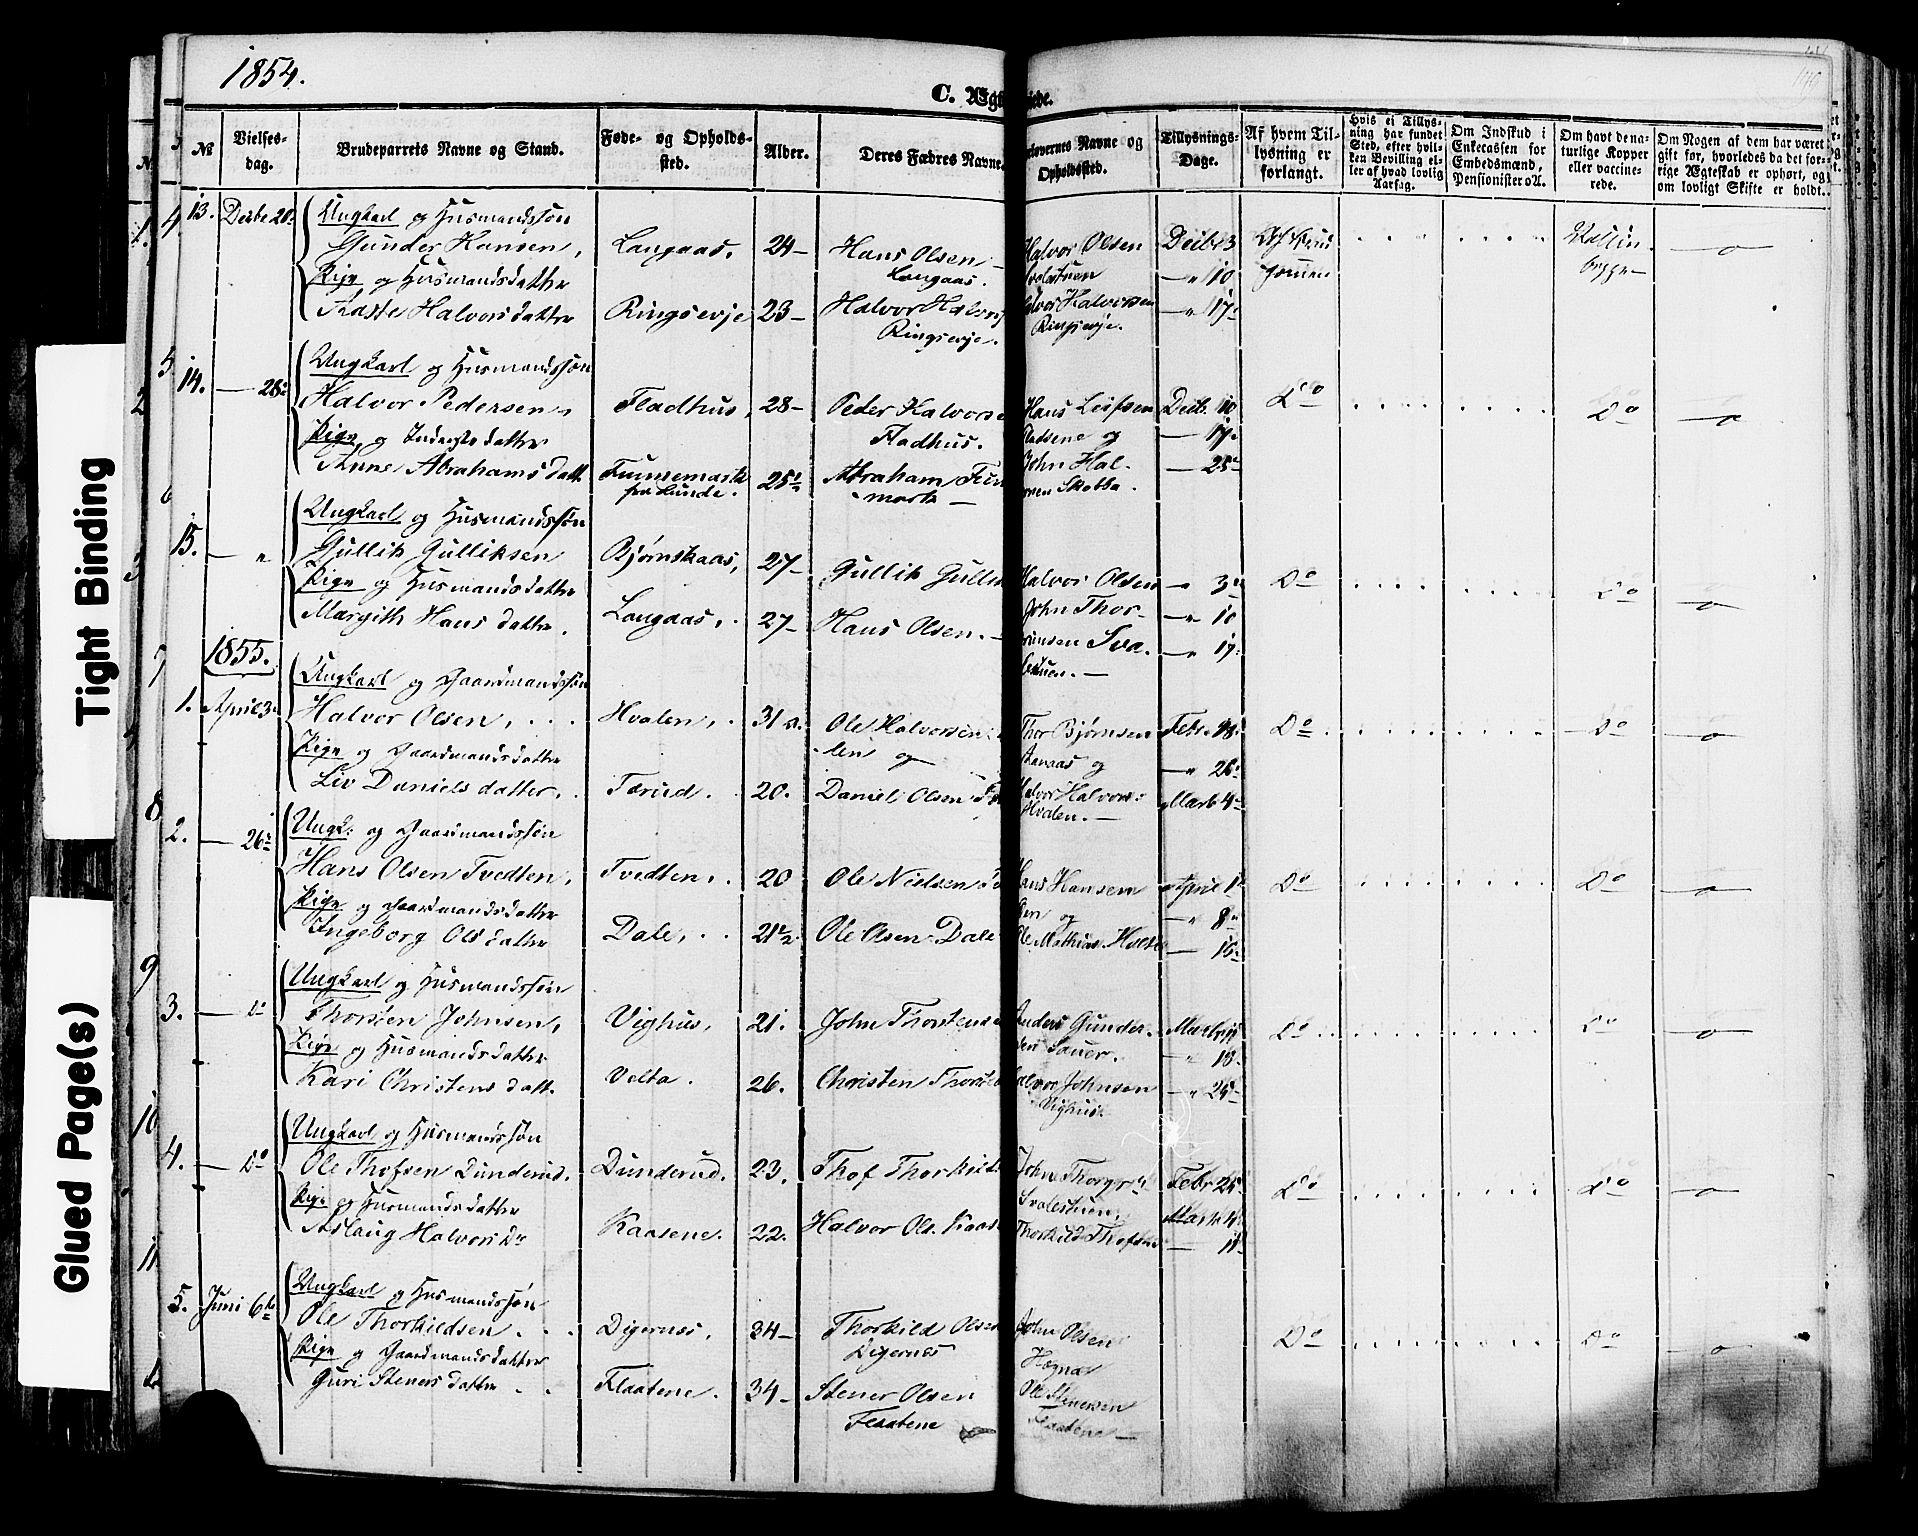 SAKO, Sauherad kirkebøker, F/Fa/L0007: Ministerialbok nr. I 7, 1851-1873, s. 149